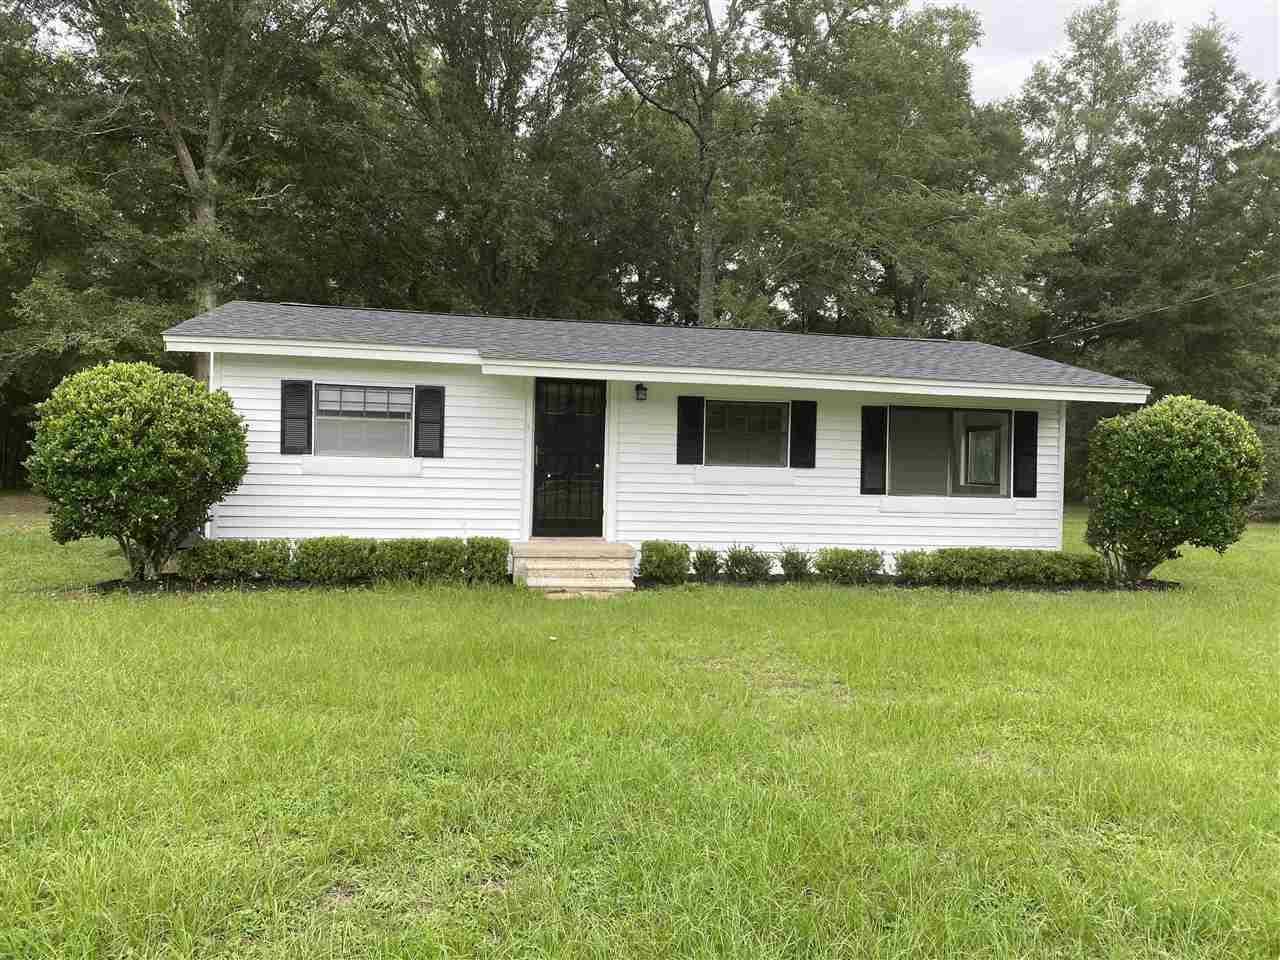 660 Henry Jones Road, Tallahassee, FL 32305 - MLS#: 337639